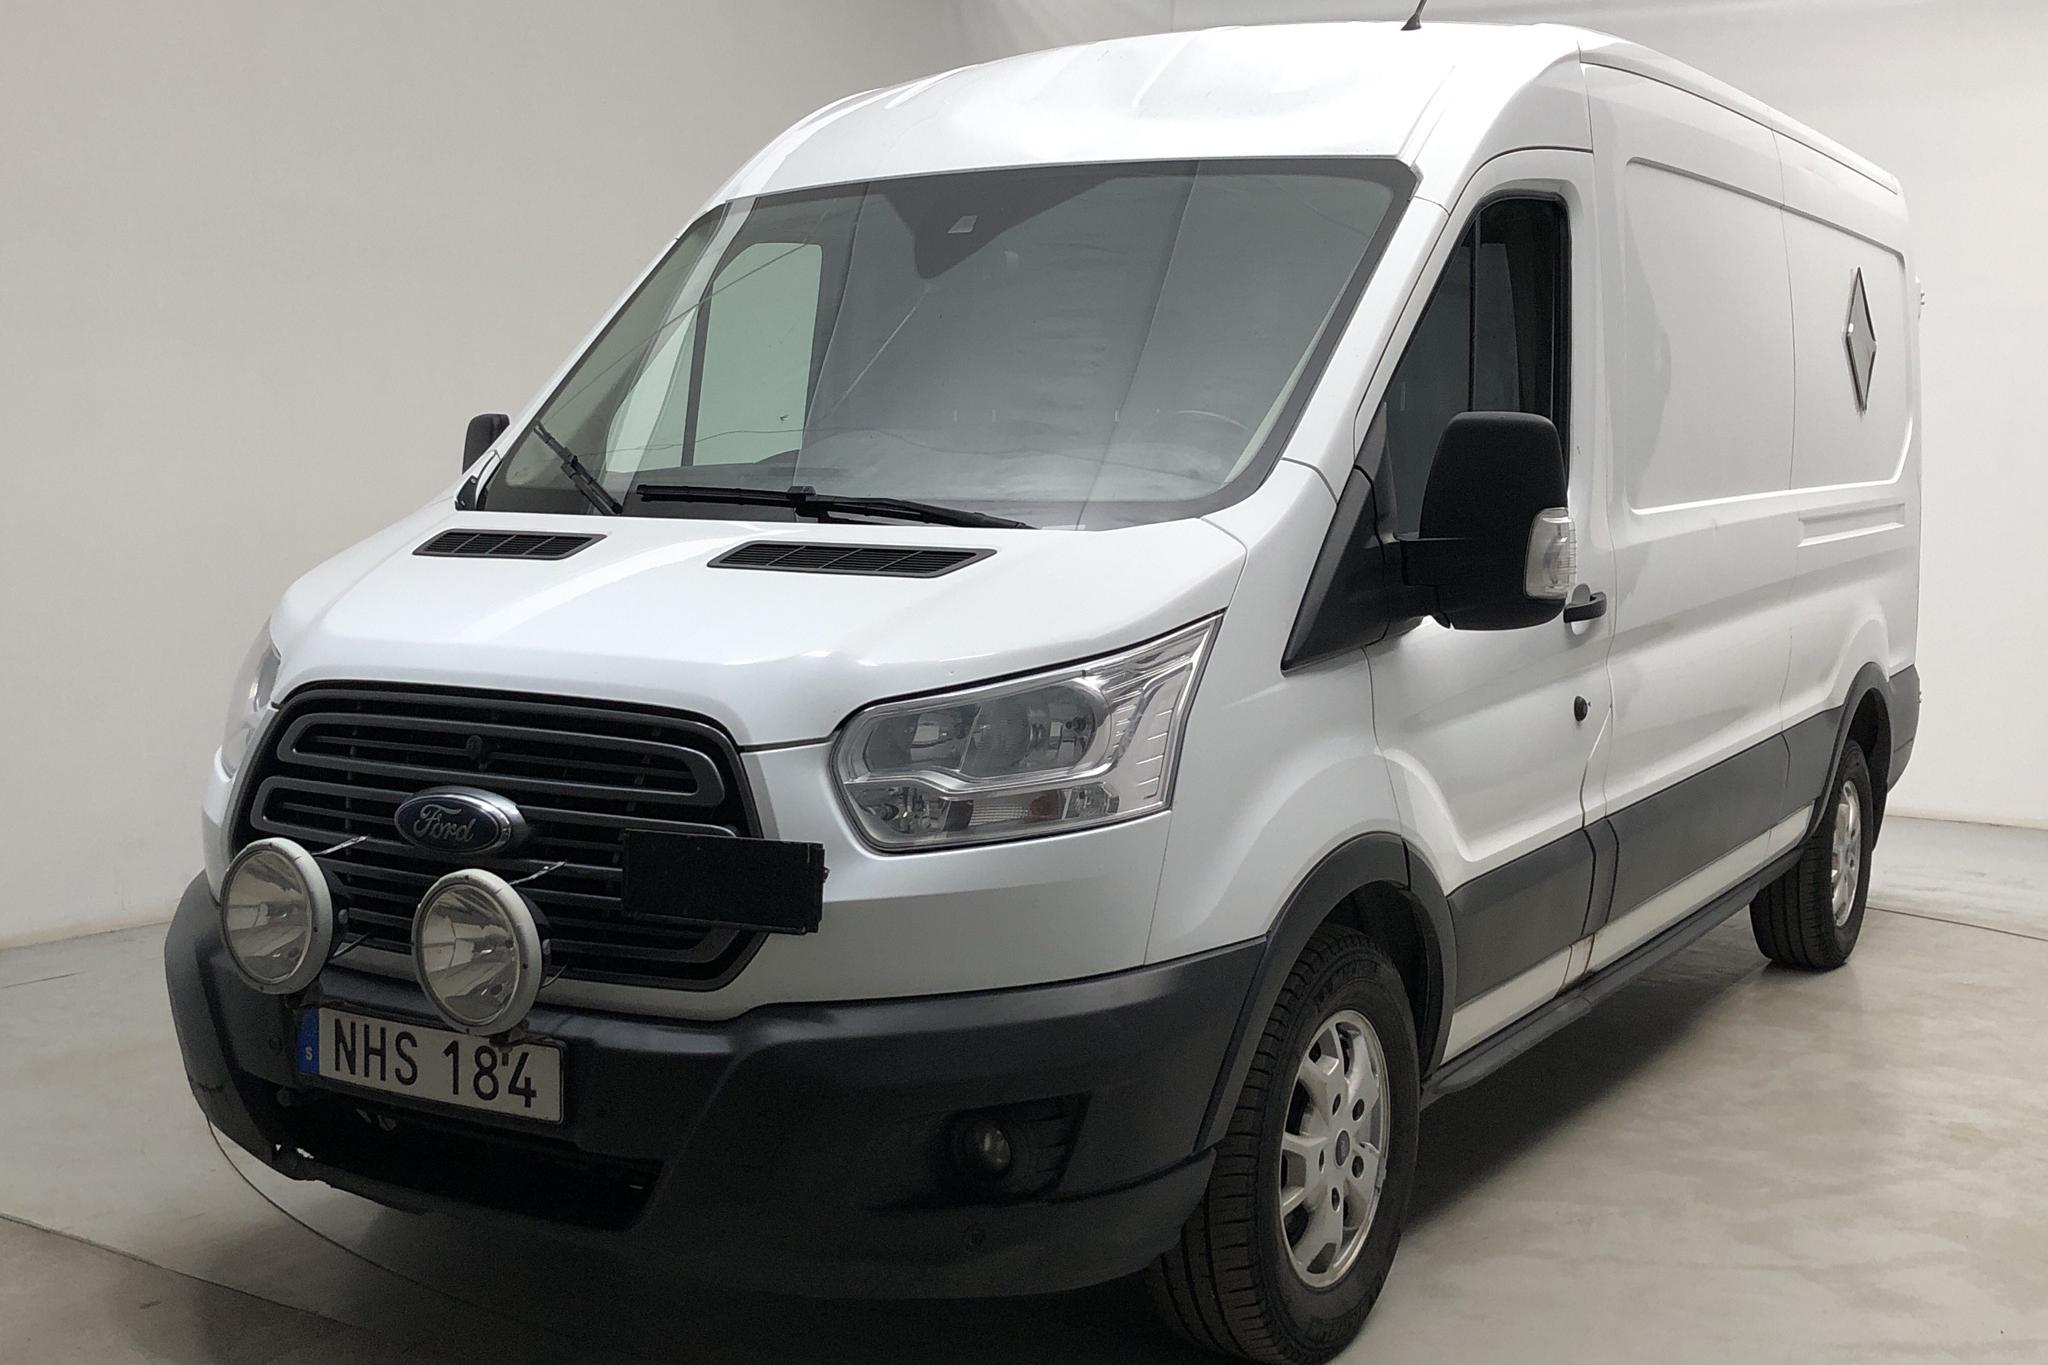 Ford Transit 350 2.2 TDCi Skåp AWD (125hk) - 19 325 mil - Manuell - vit - 2016